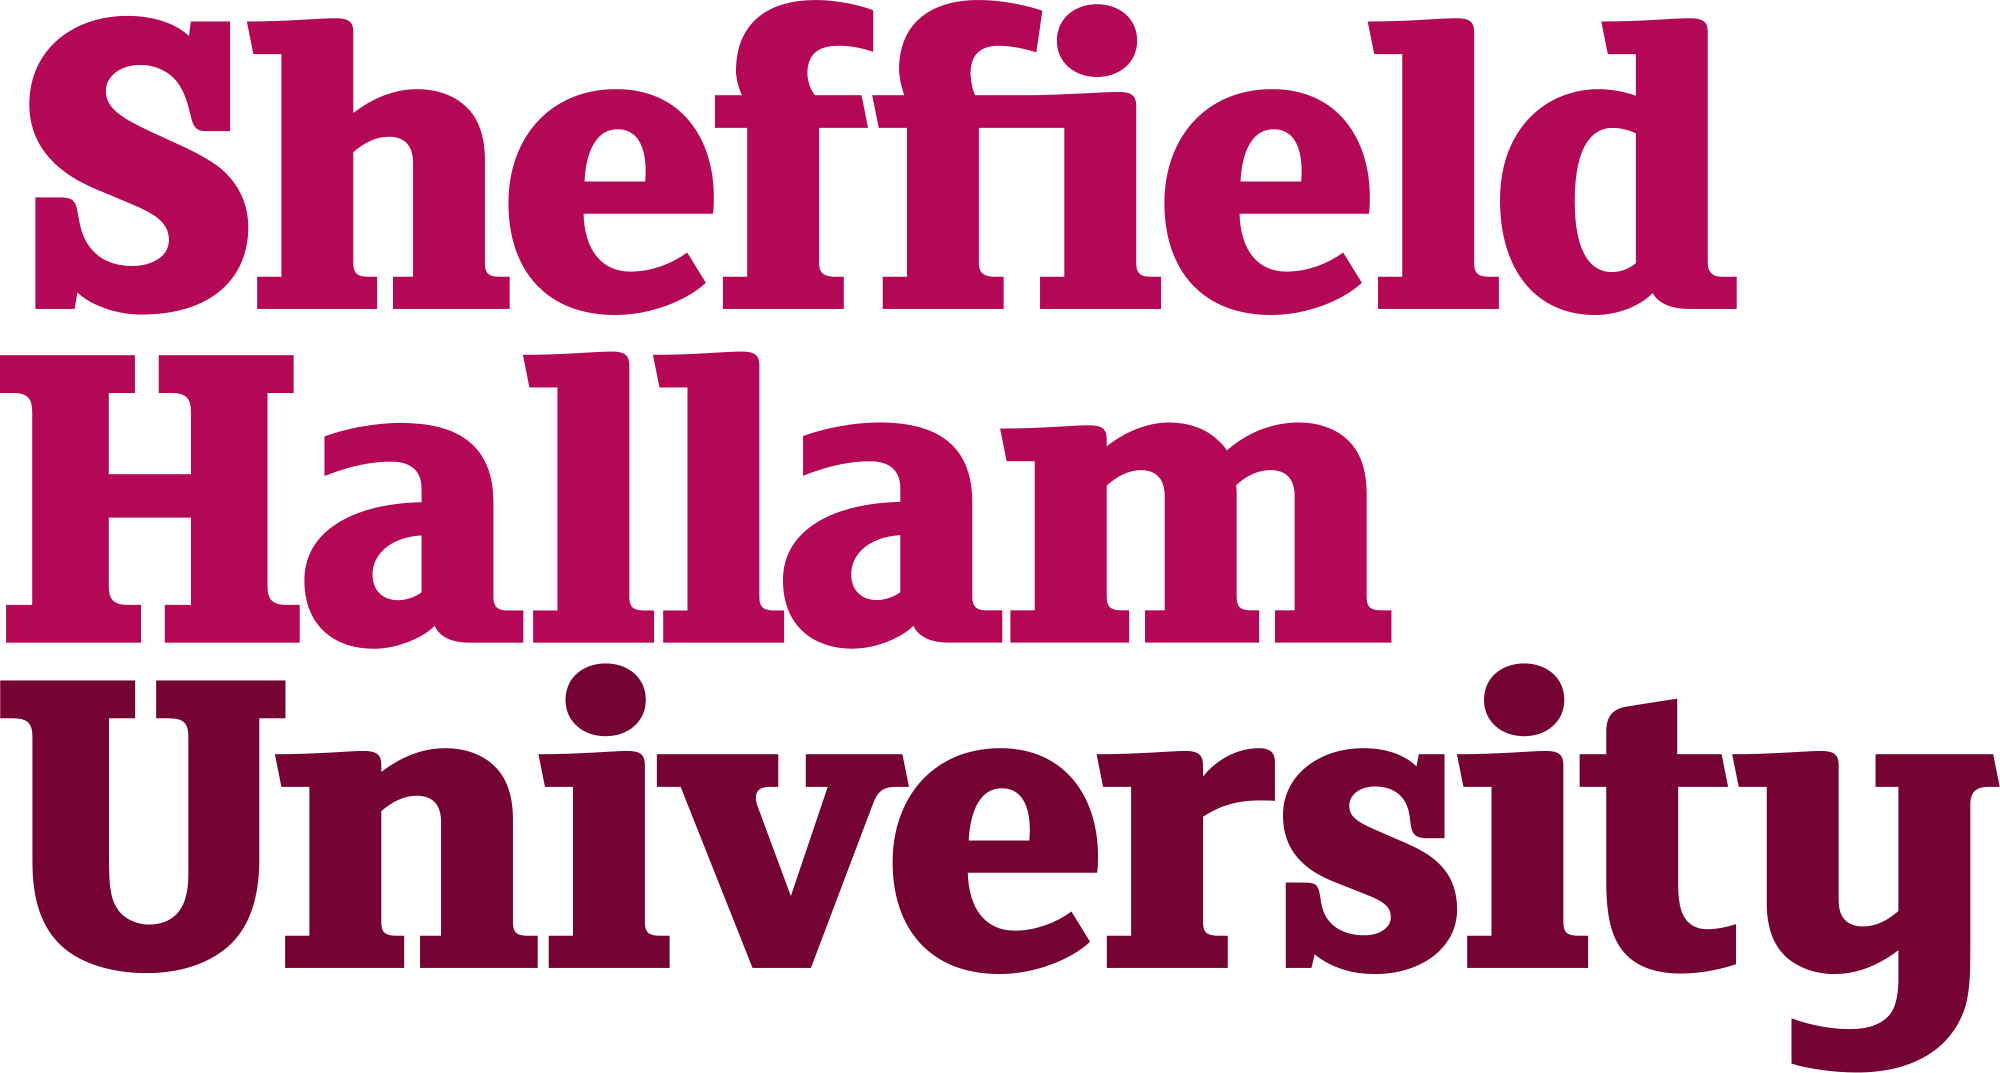 Sheffield Hallam Uni transparent.png